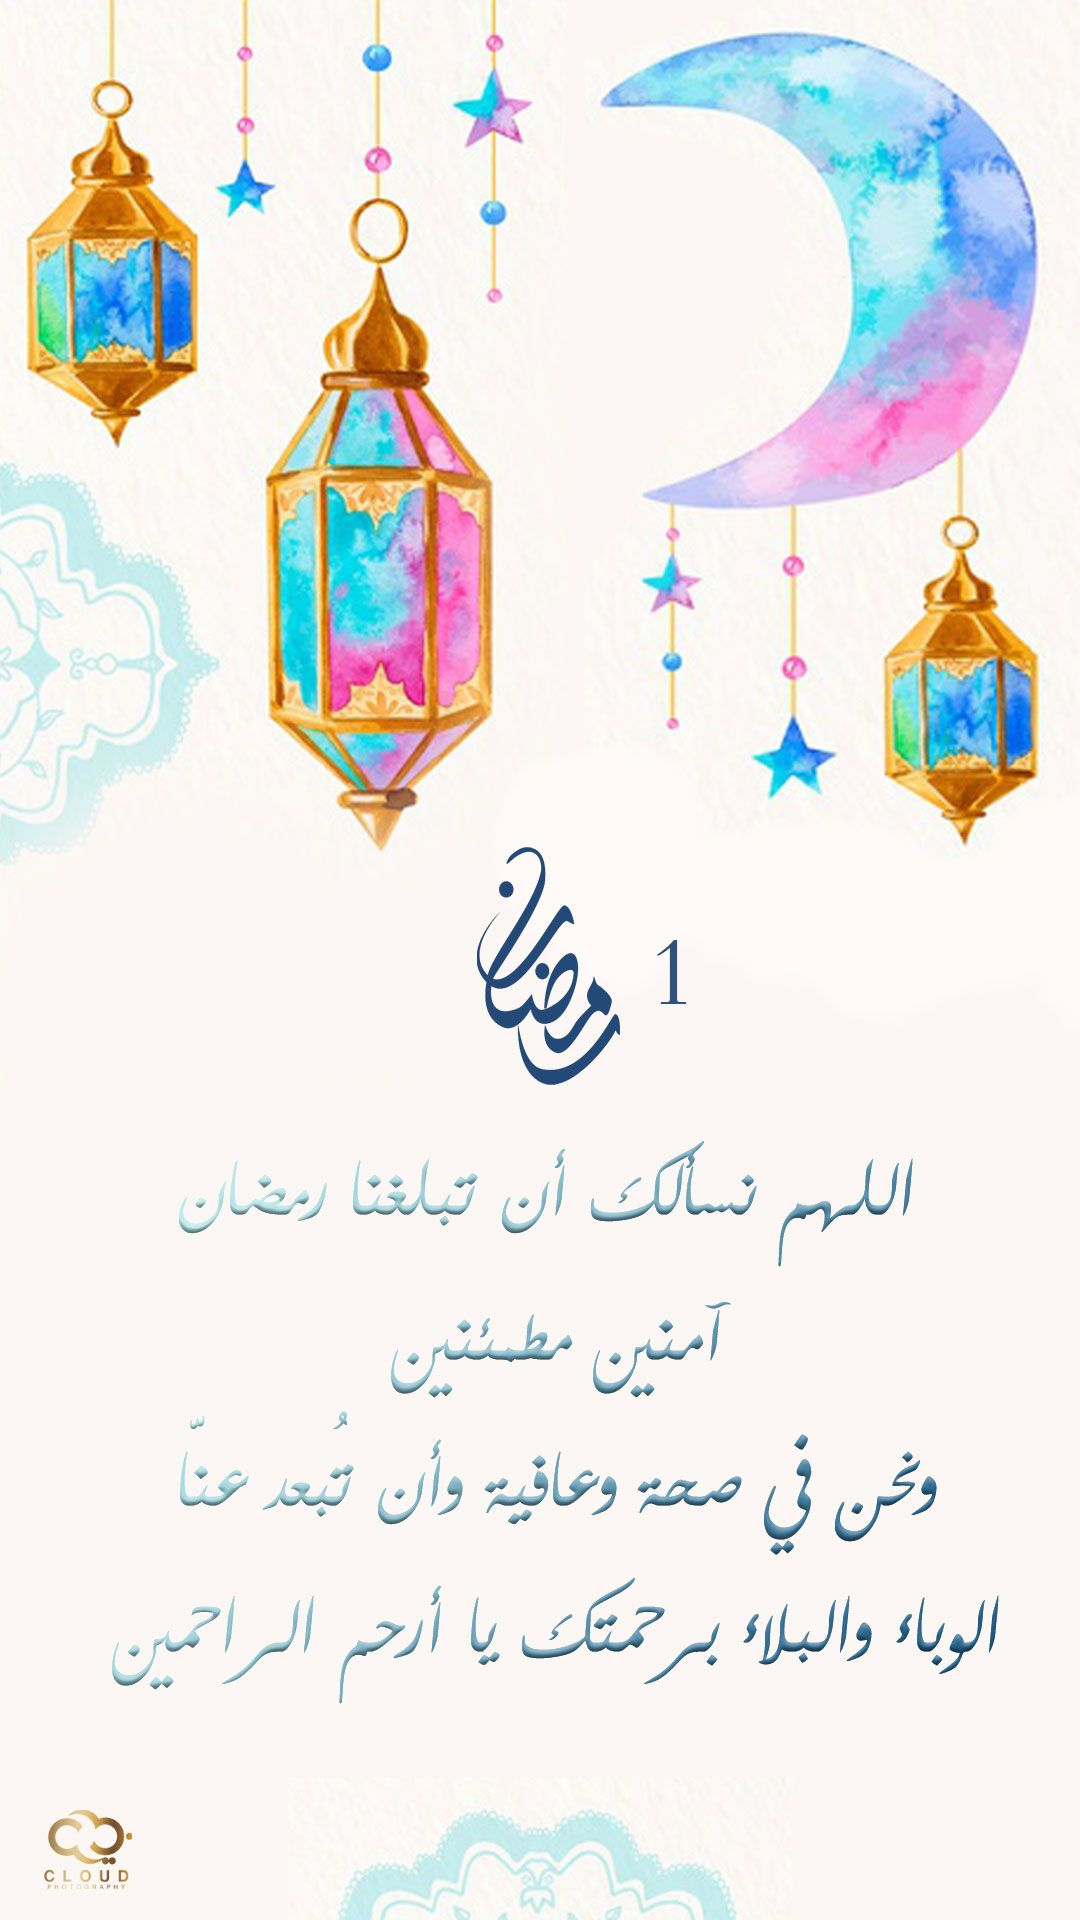 رمضان كريم رمزيات تصاميم Iphone Wallpaper Quotes Love Dark Wallpaper Iphone Ramadan Crafts